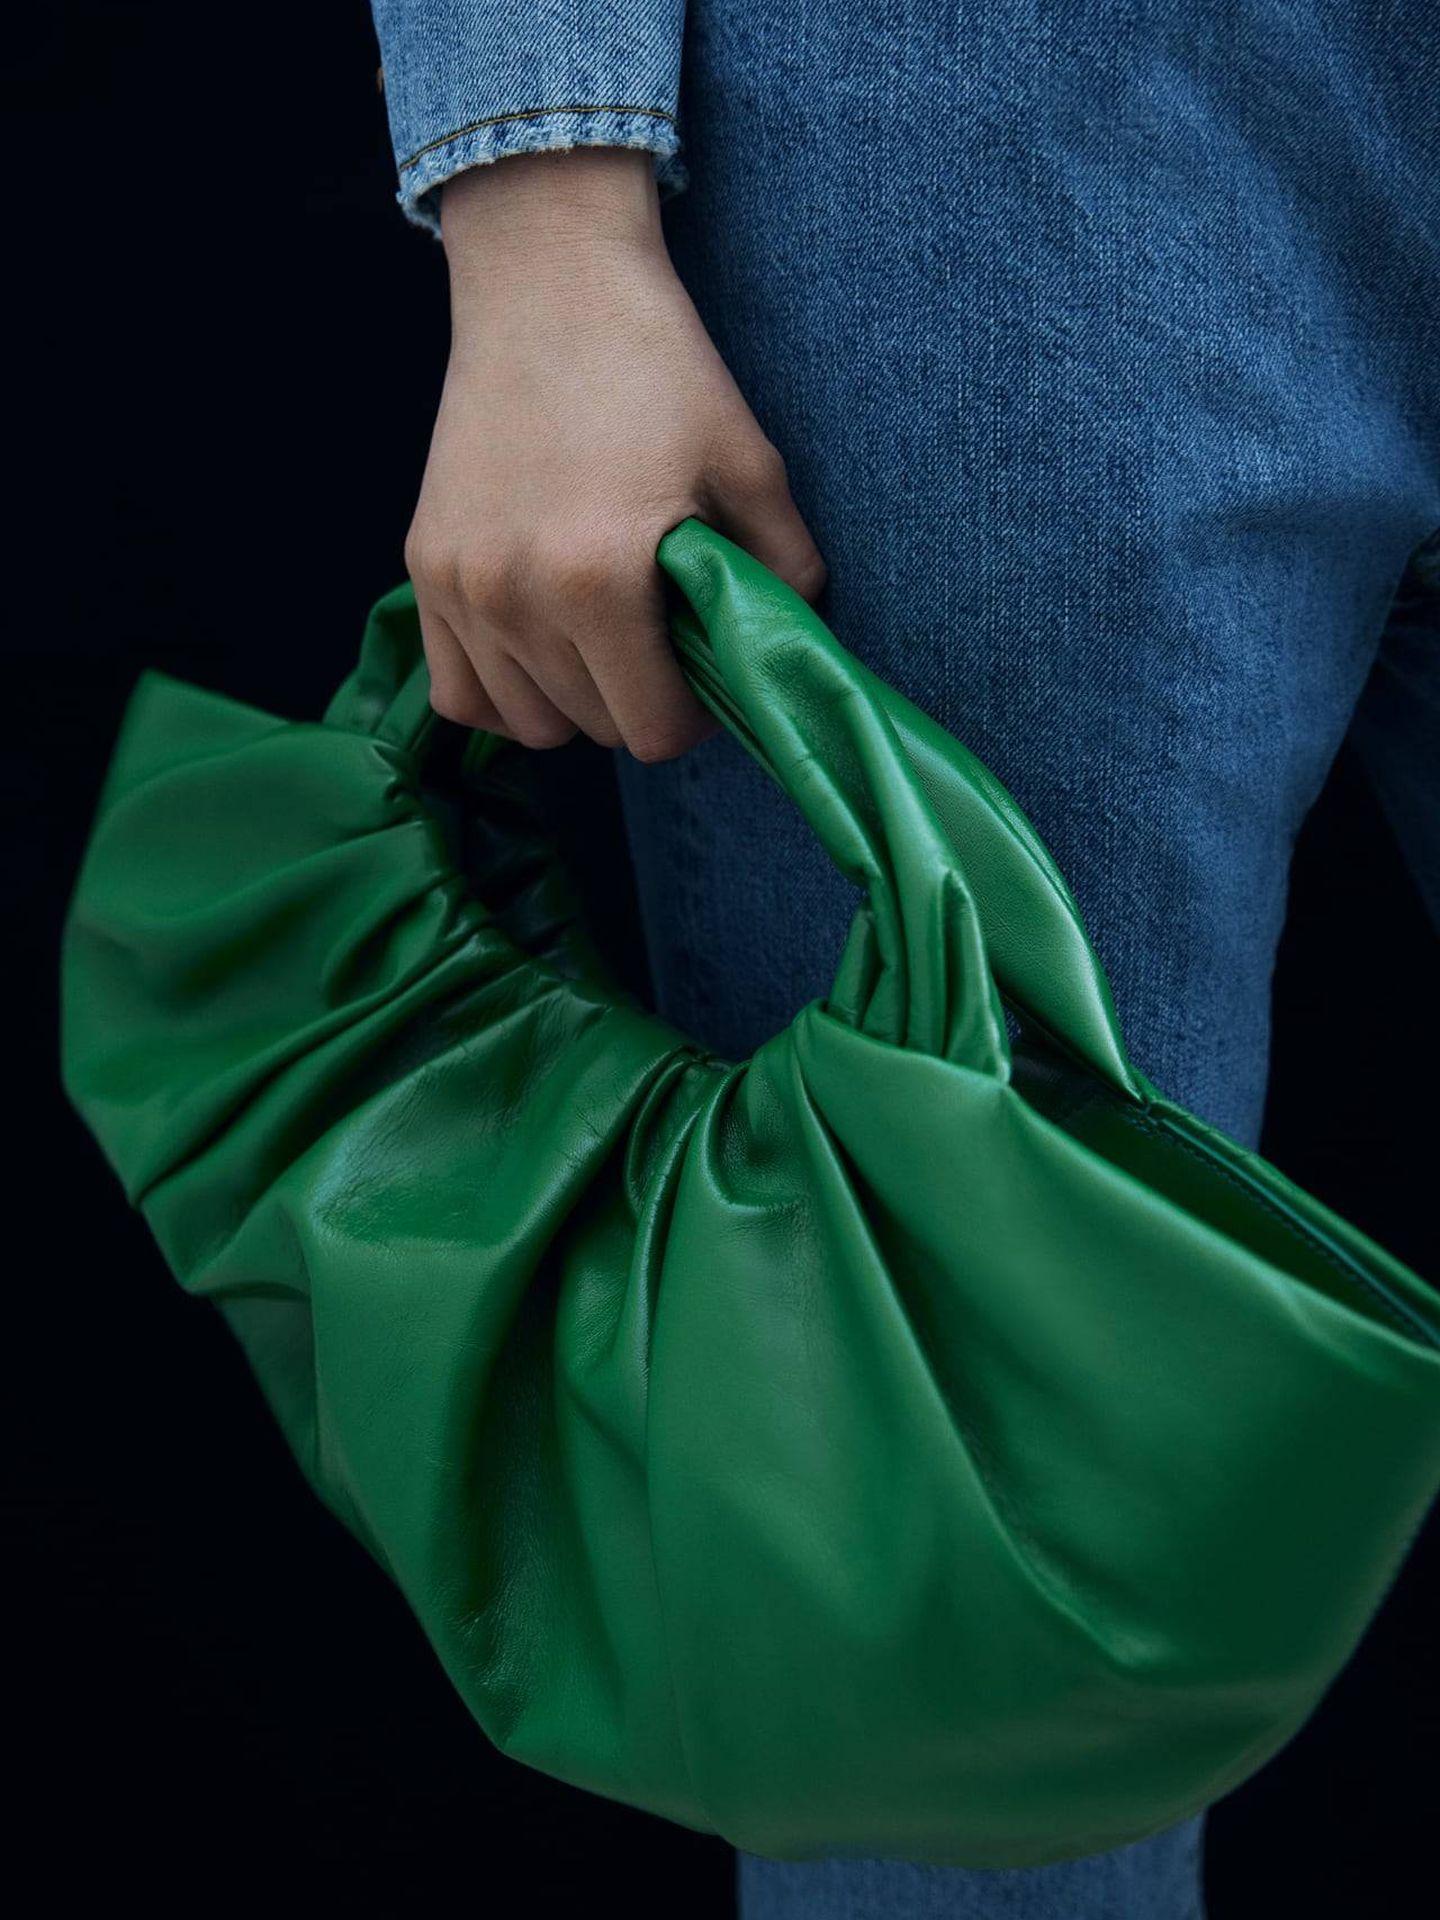 Bolso verde de Zara. (Cortesía)